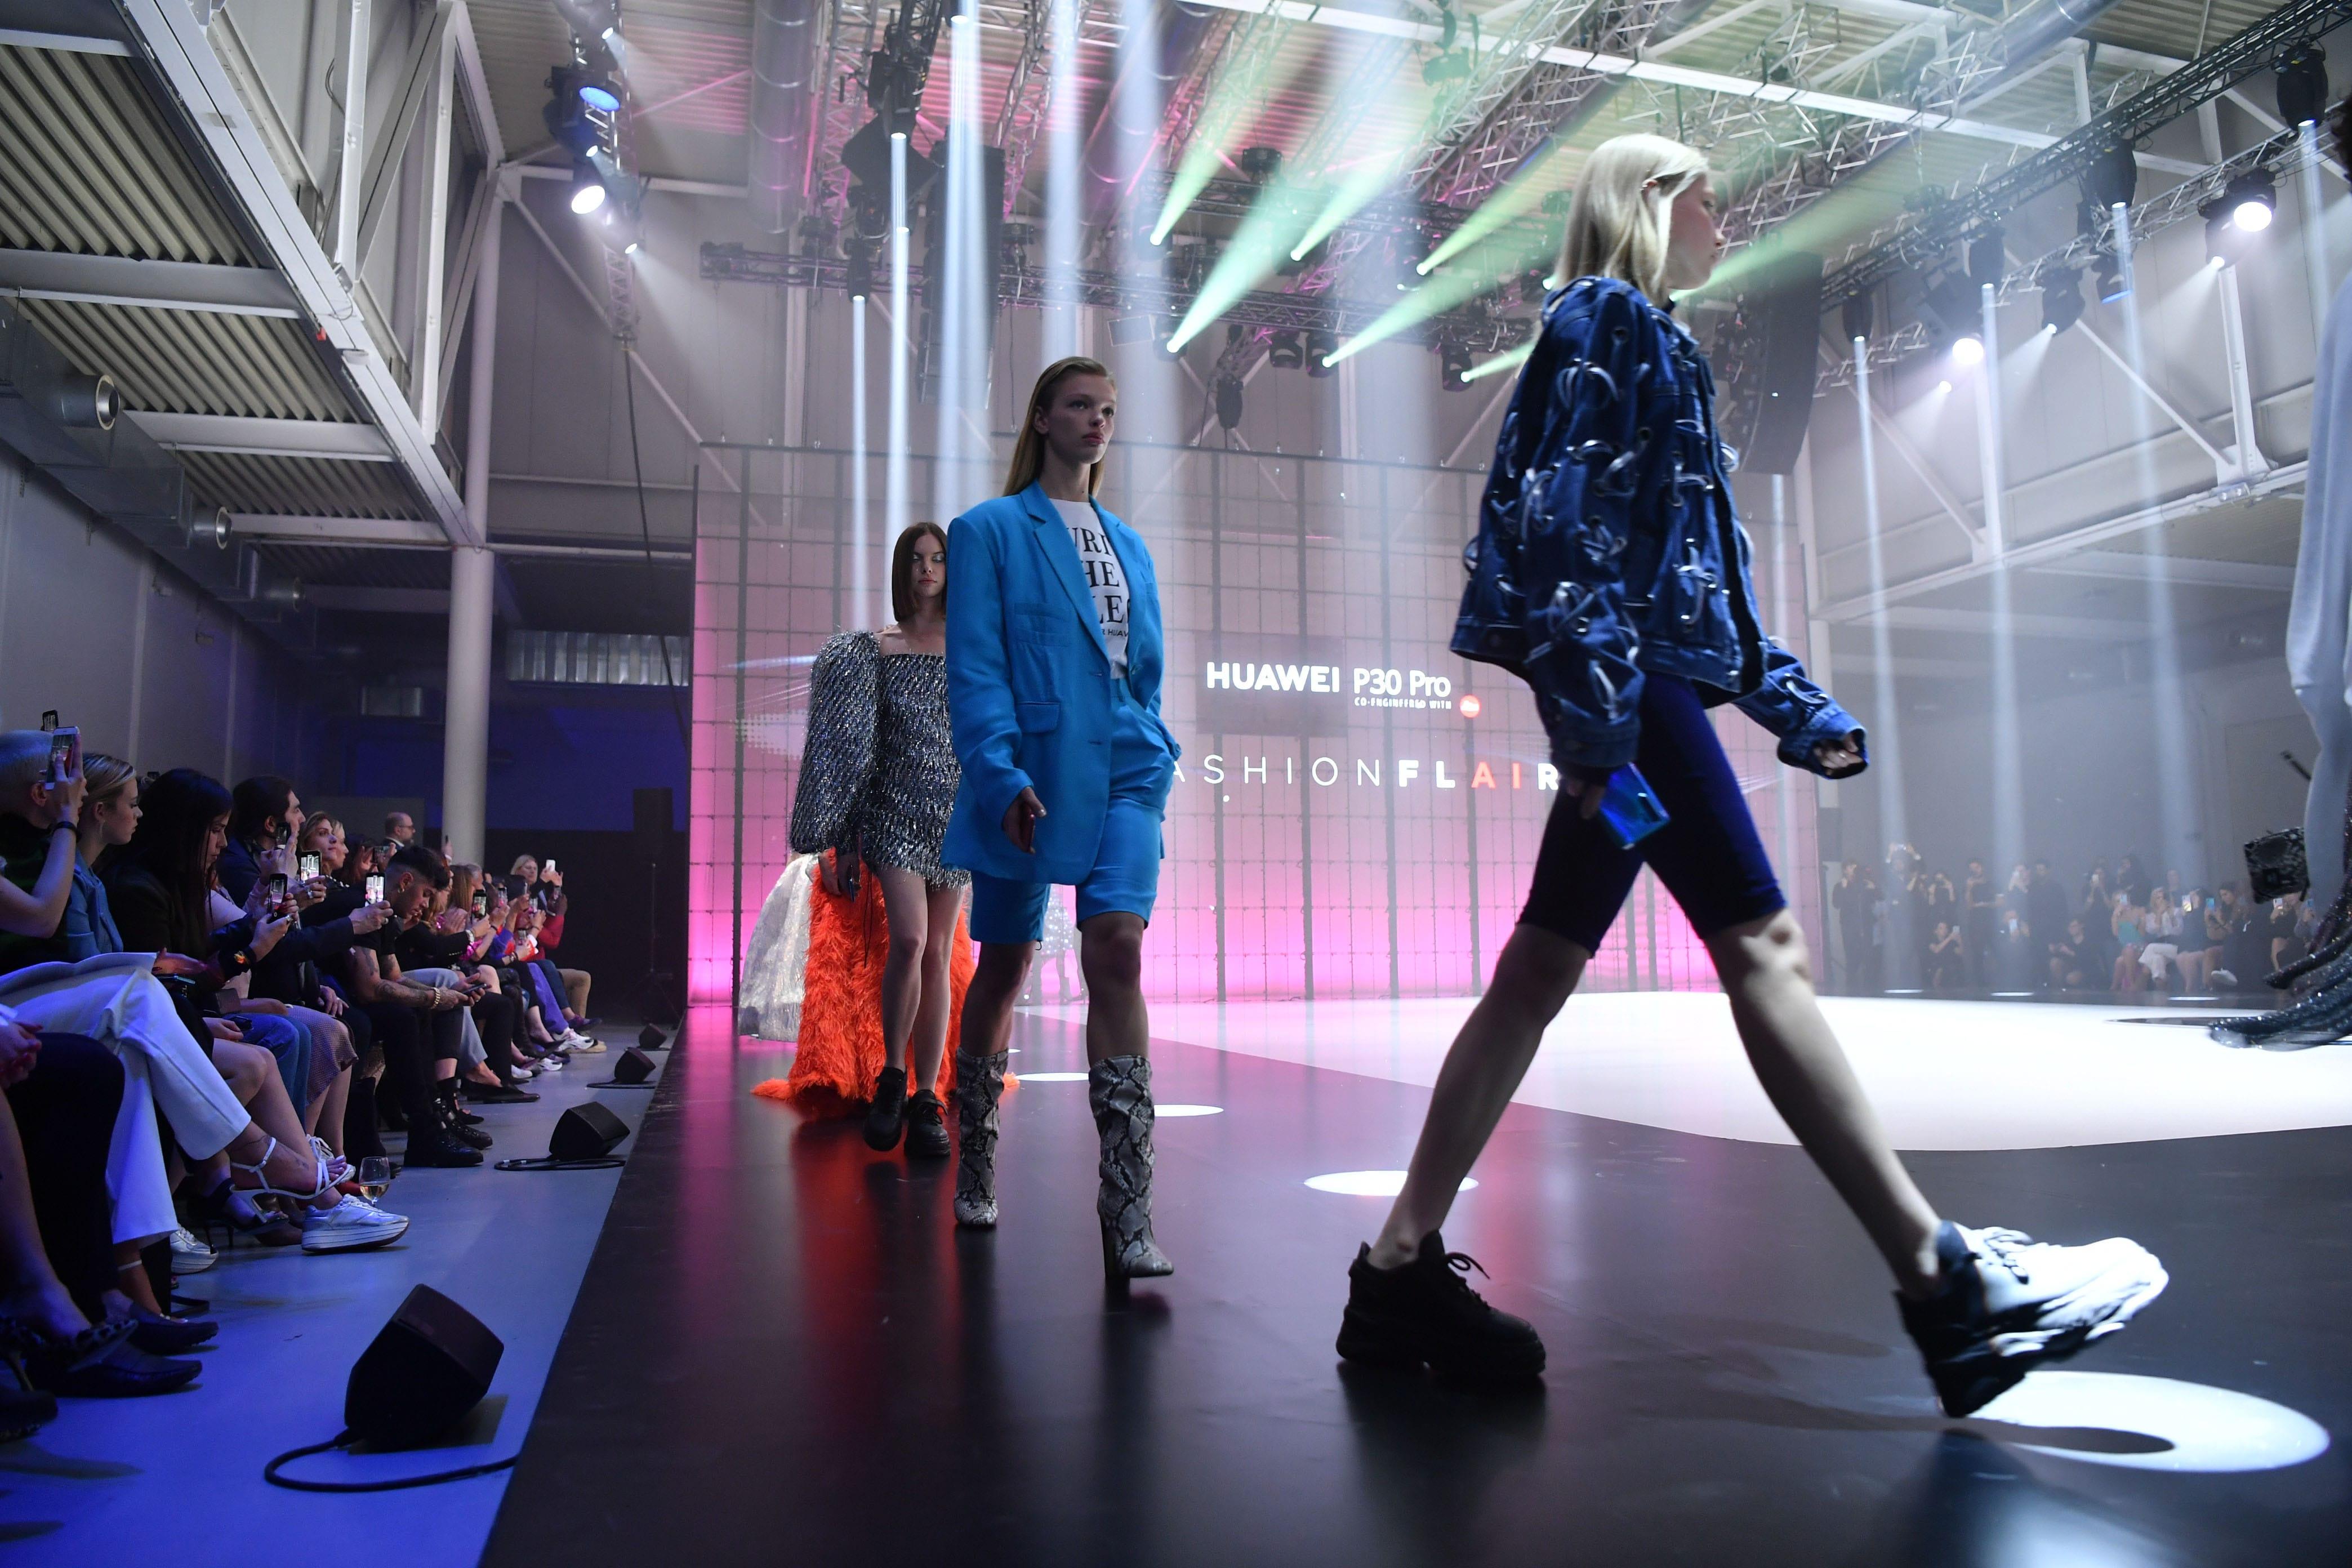 Modelle Huawei Fashion Flair